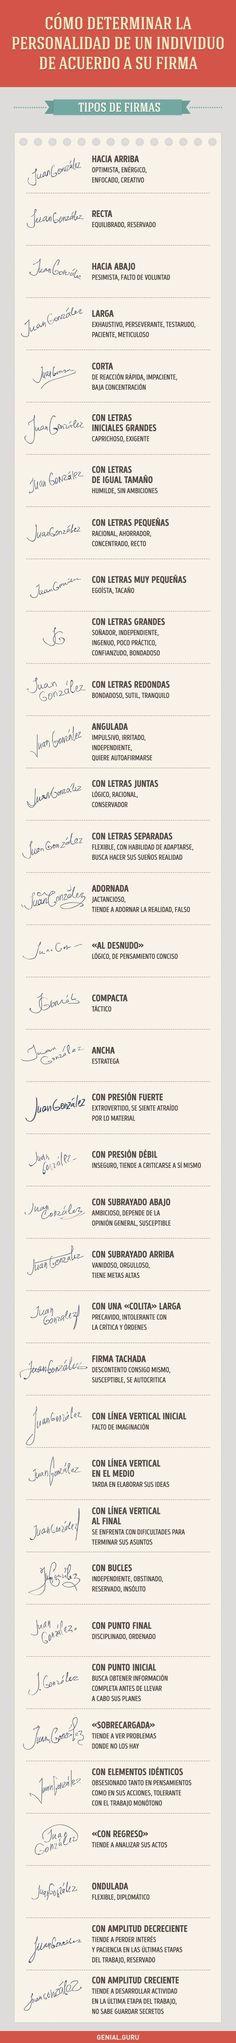 50 Rich & Famous People Signatures - Leader Politicians ...